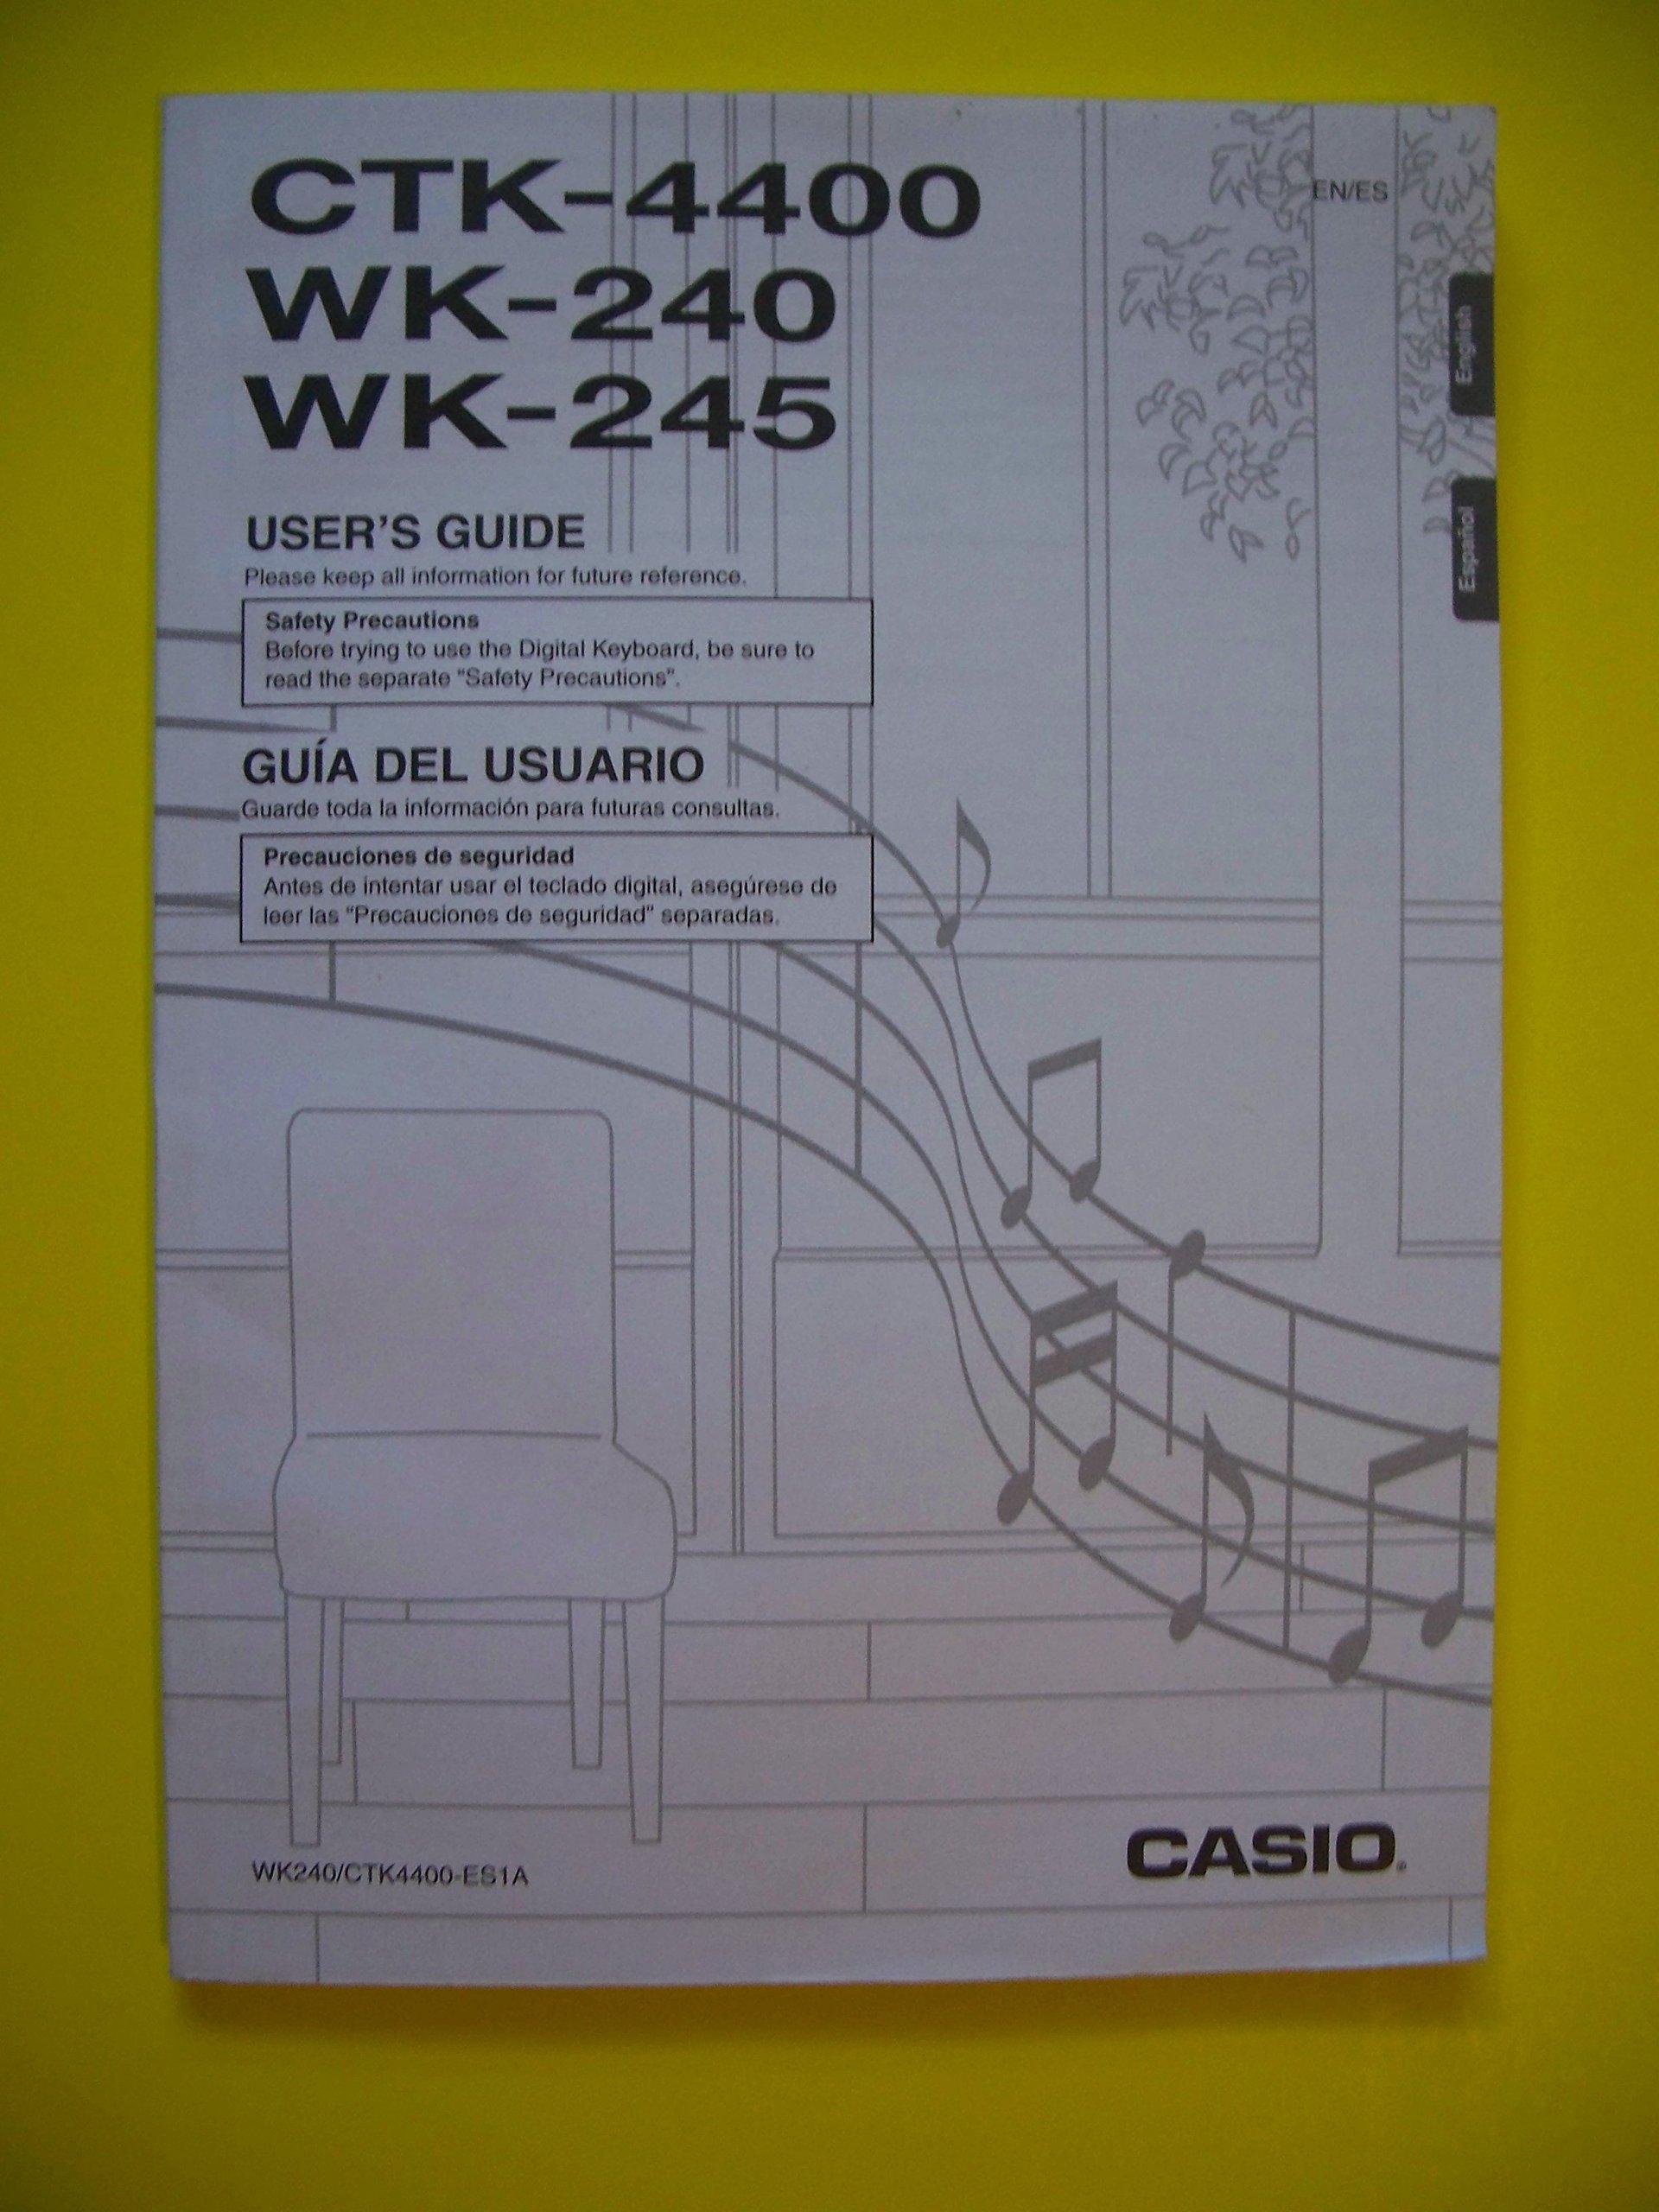 CTK-4400, WK-240, WK-245 Users Guide Paperback – 2014